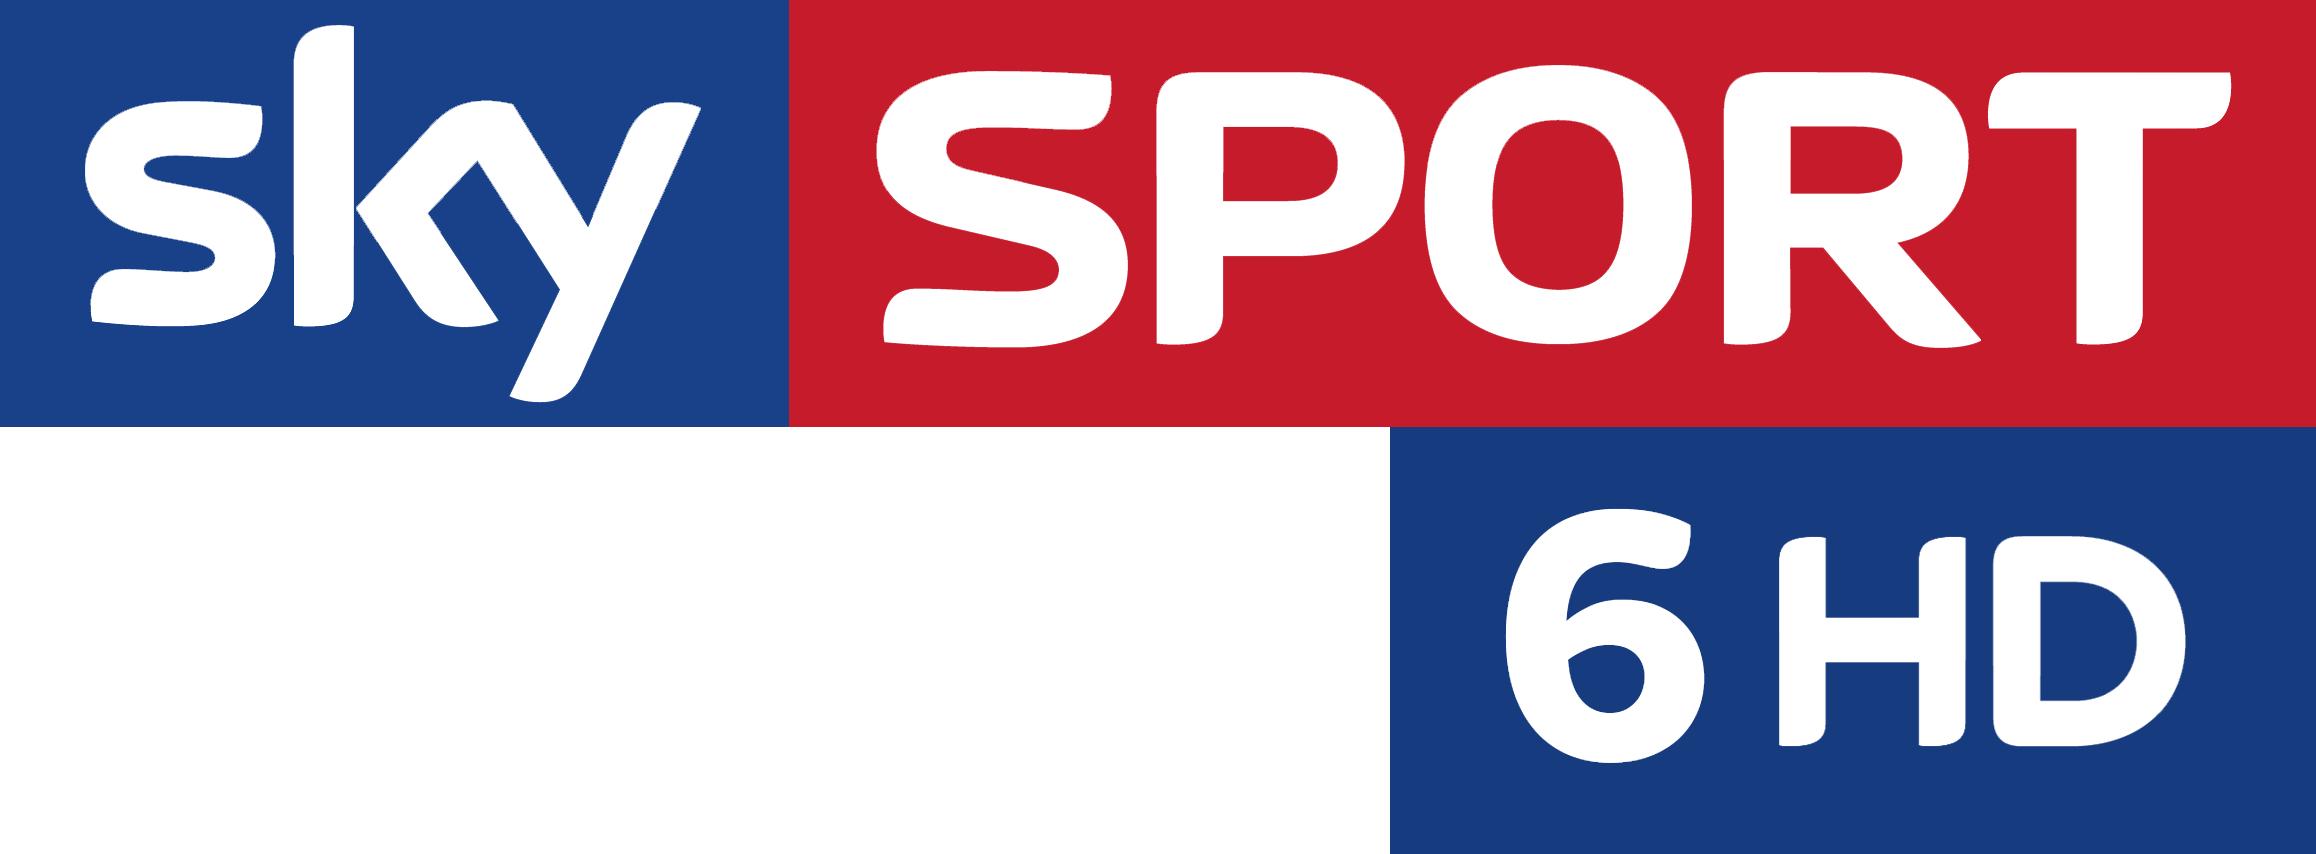 Sky Sport 6